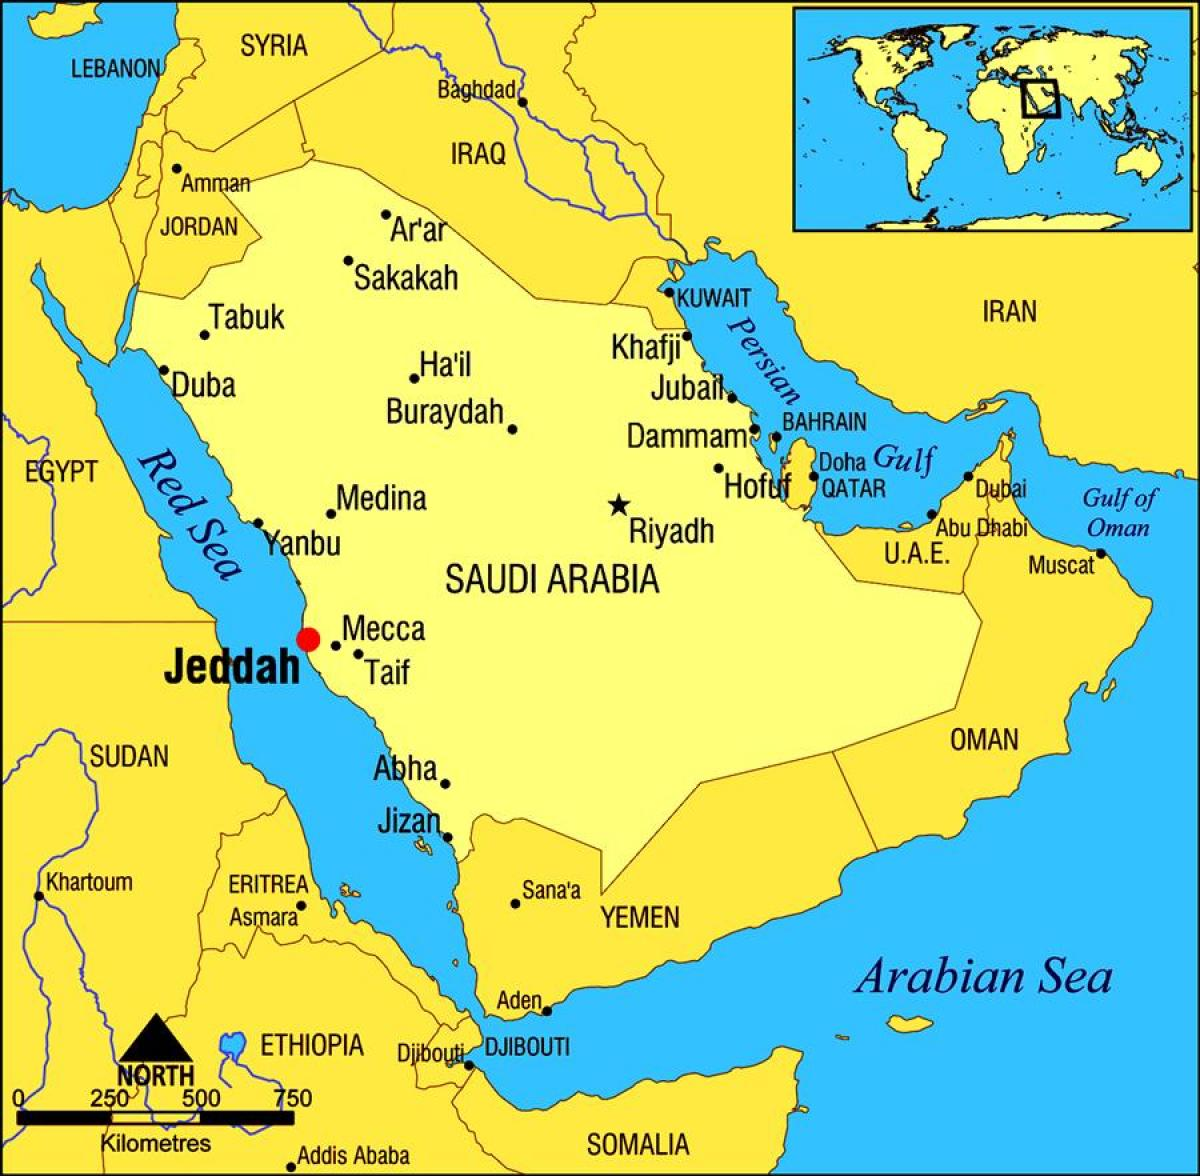 Jeddah Saudi Arabia map - Jeddah KSA map (Western Asia - Asia)